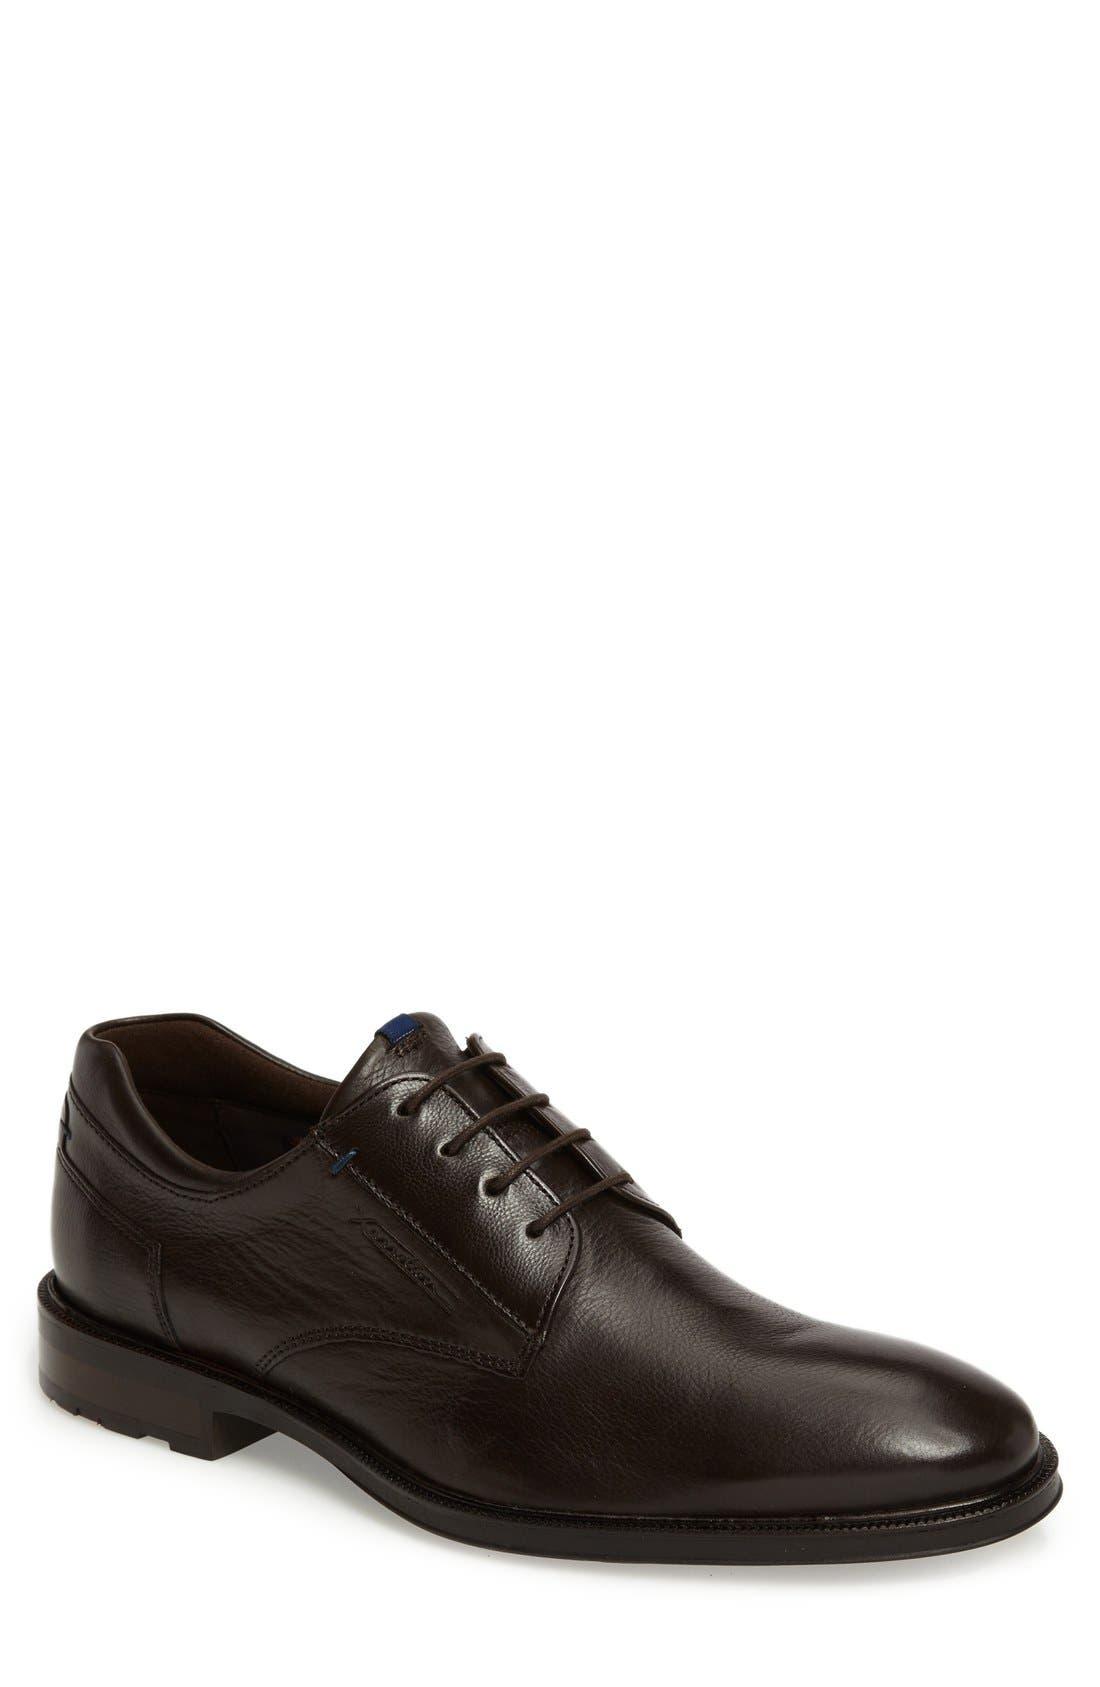 Alternate Image 1 Selected - Lloyd Mare Plain Toe Derby (Men)